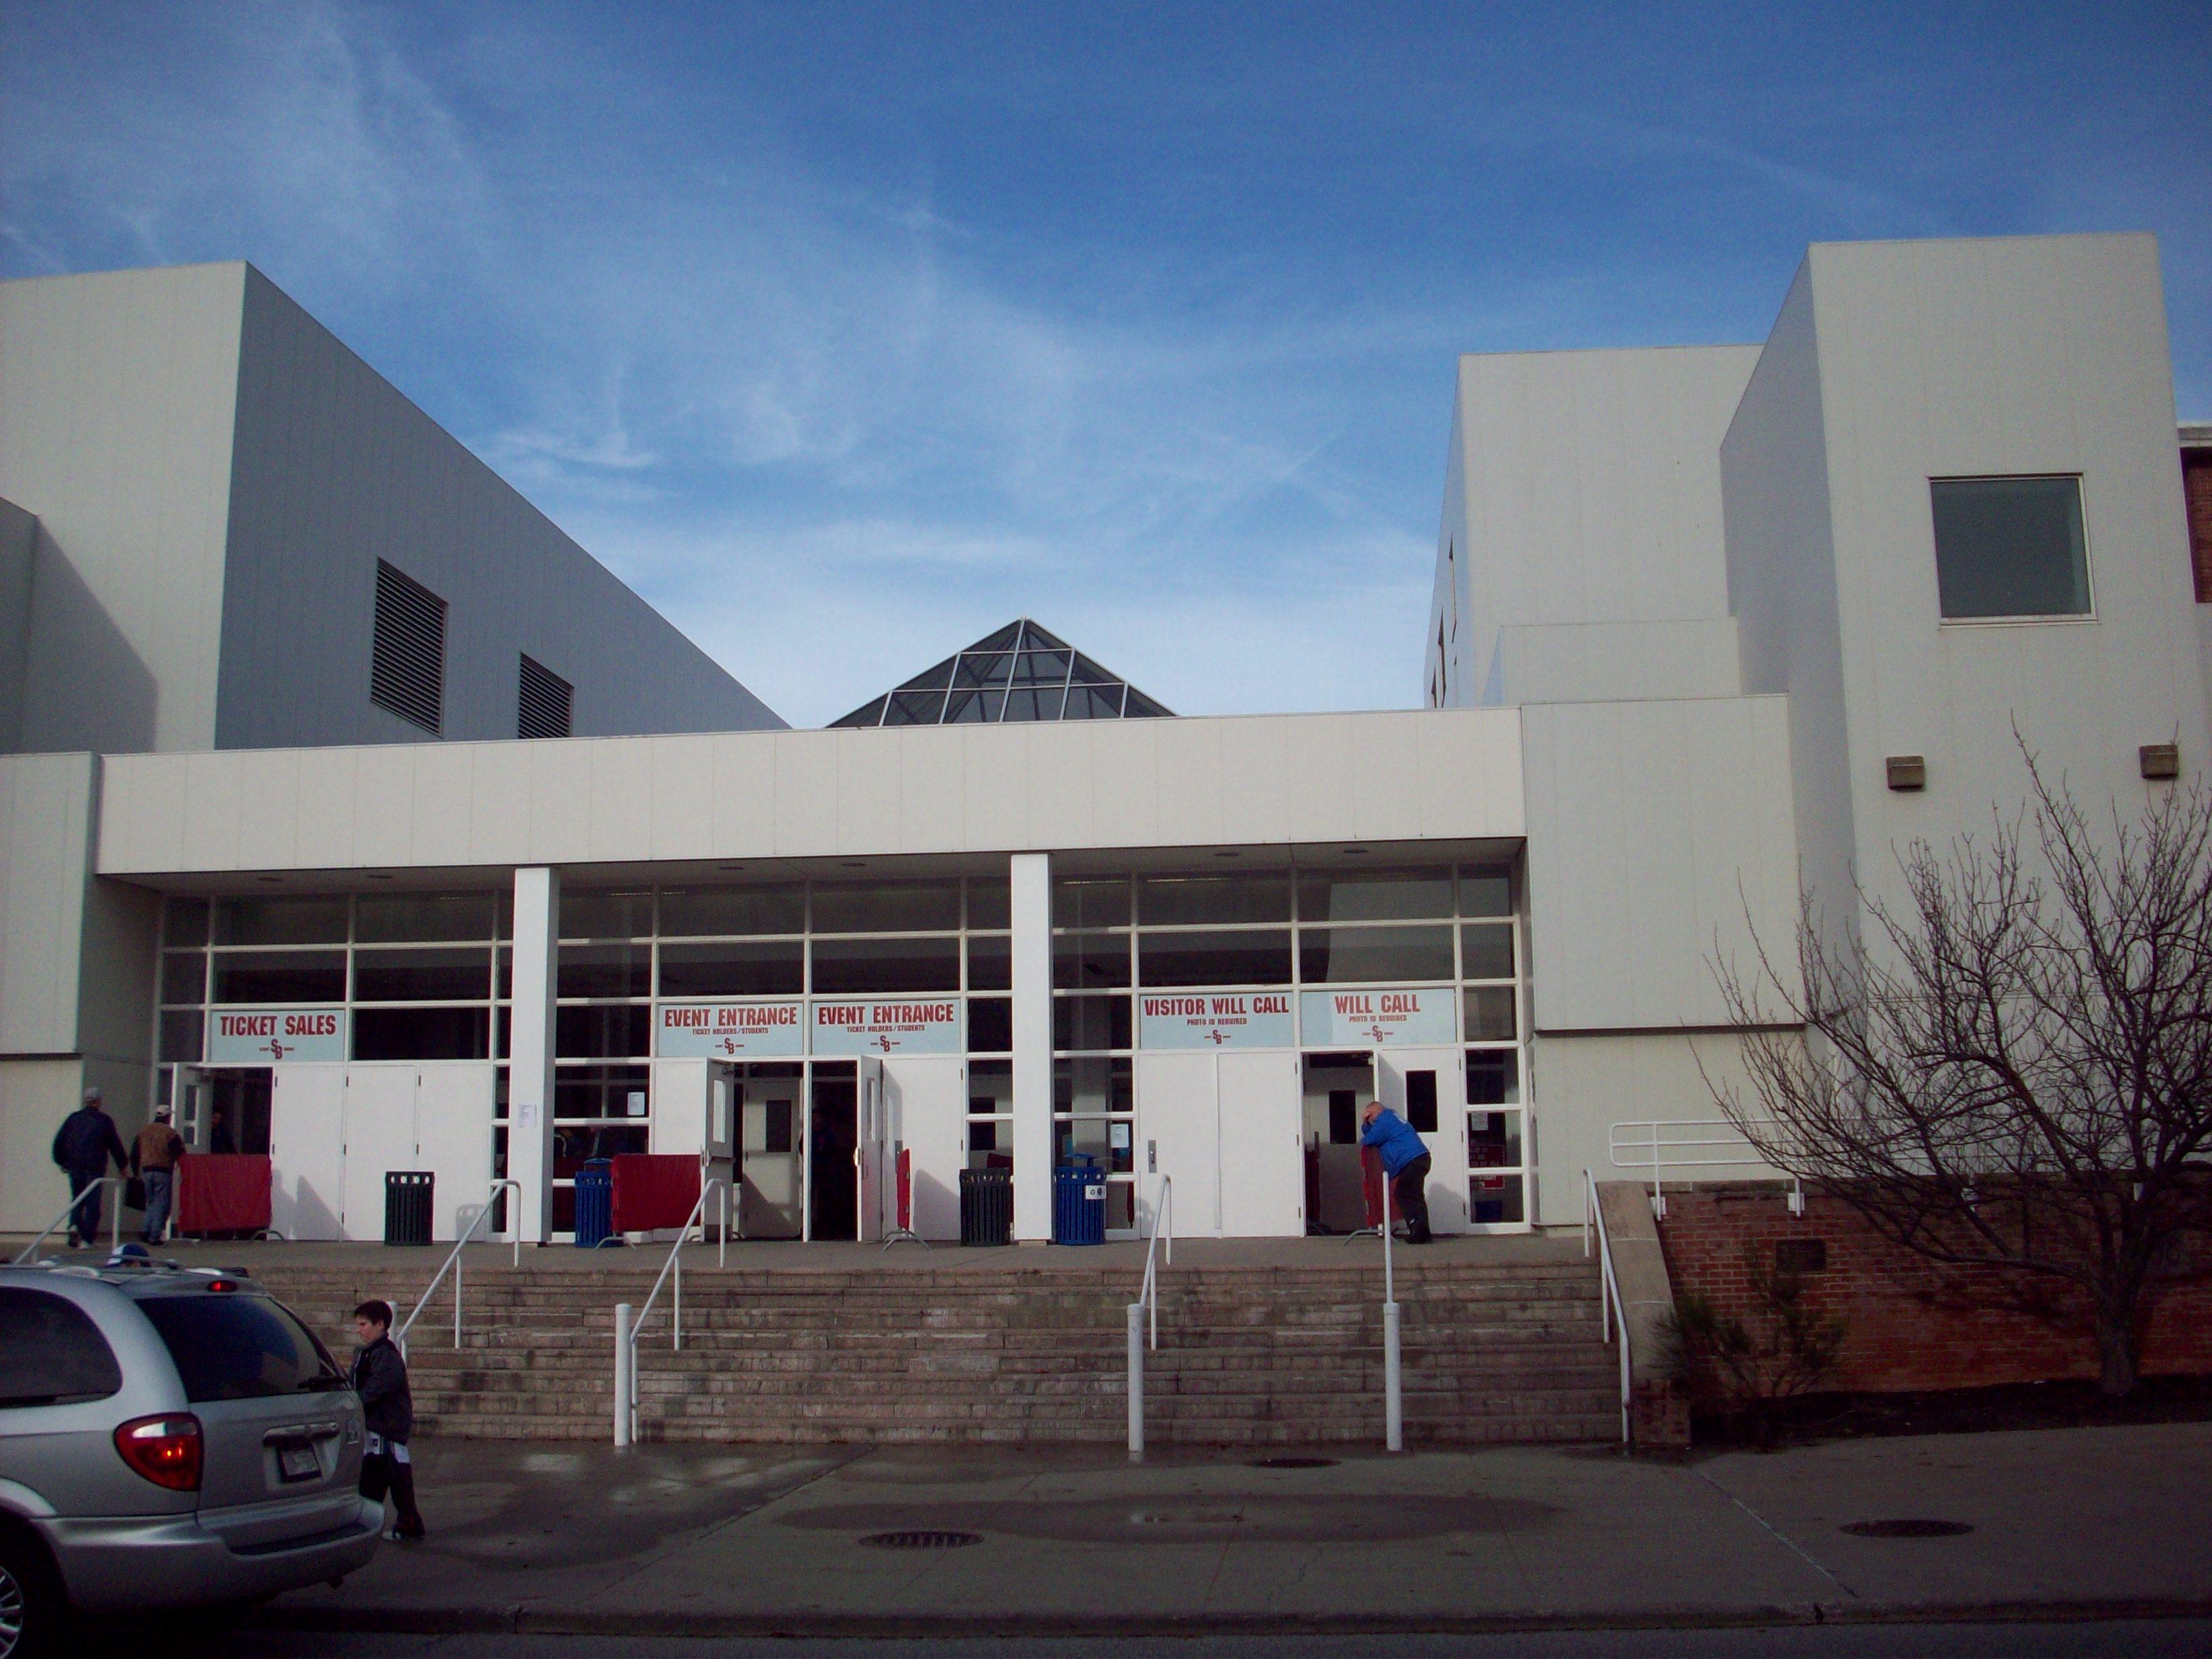 Island Federal Credit Union Arena – Stadium and Arena Visits